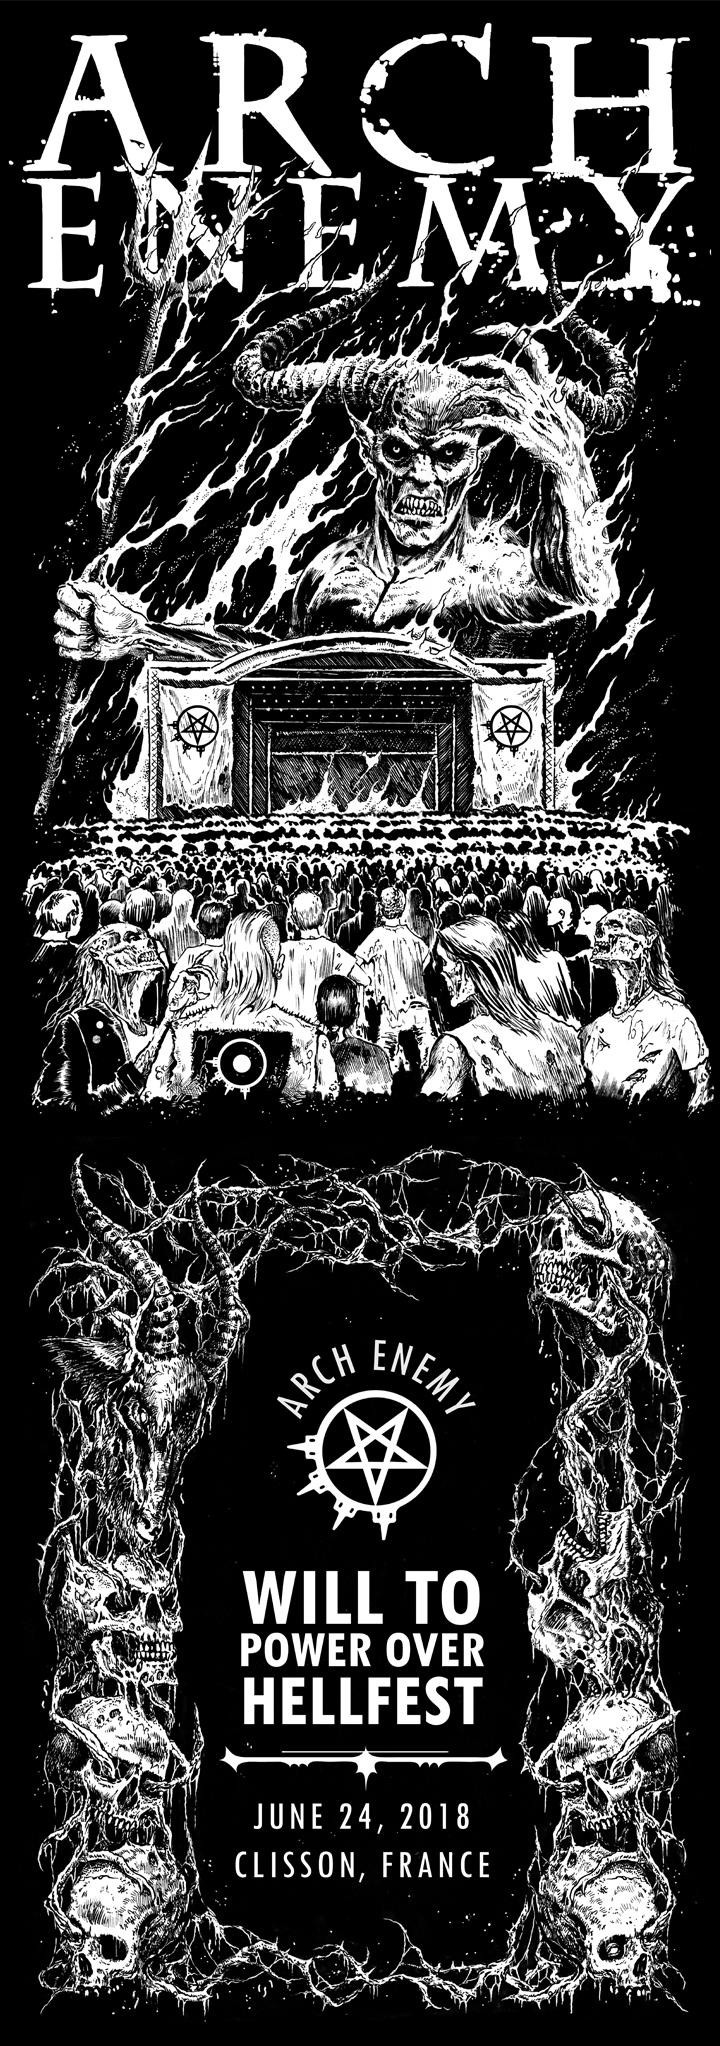 2018_ARCH ENEMY_Hellfest_Riddick_thumbnail